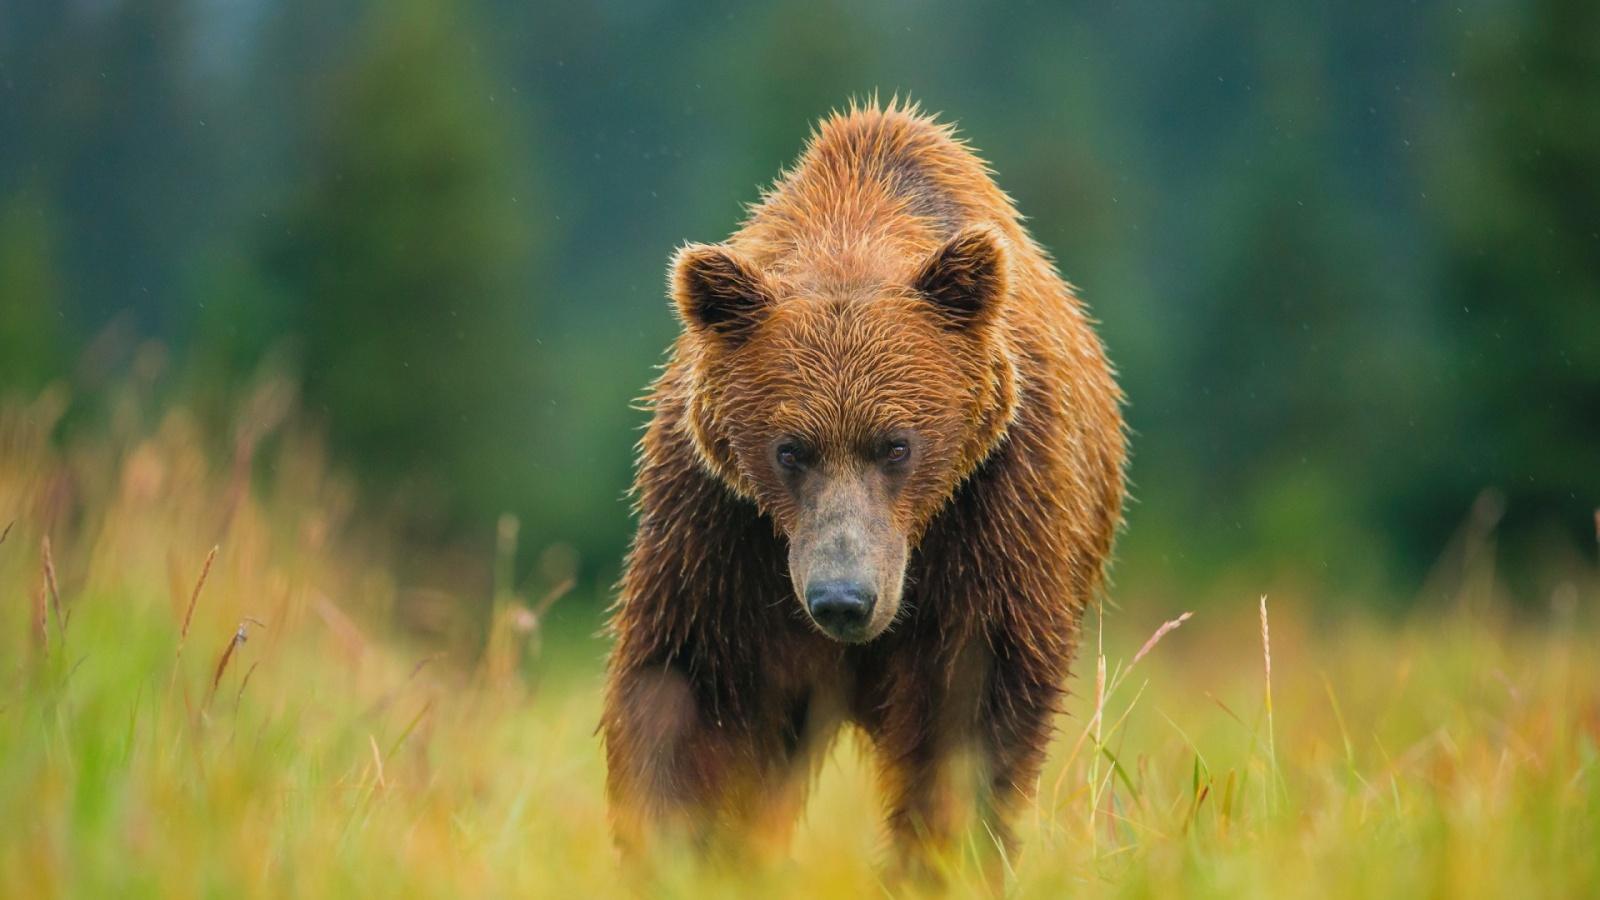 bear wallpapers download